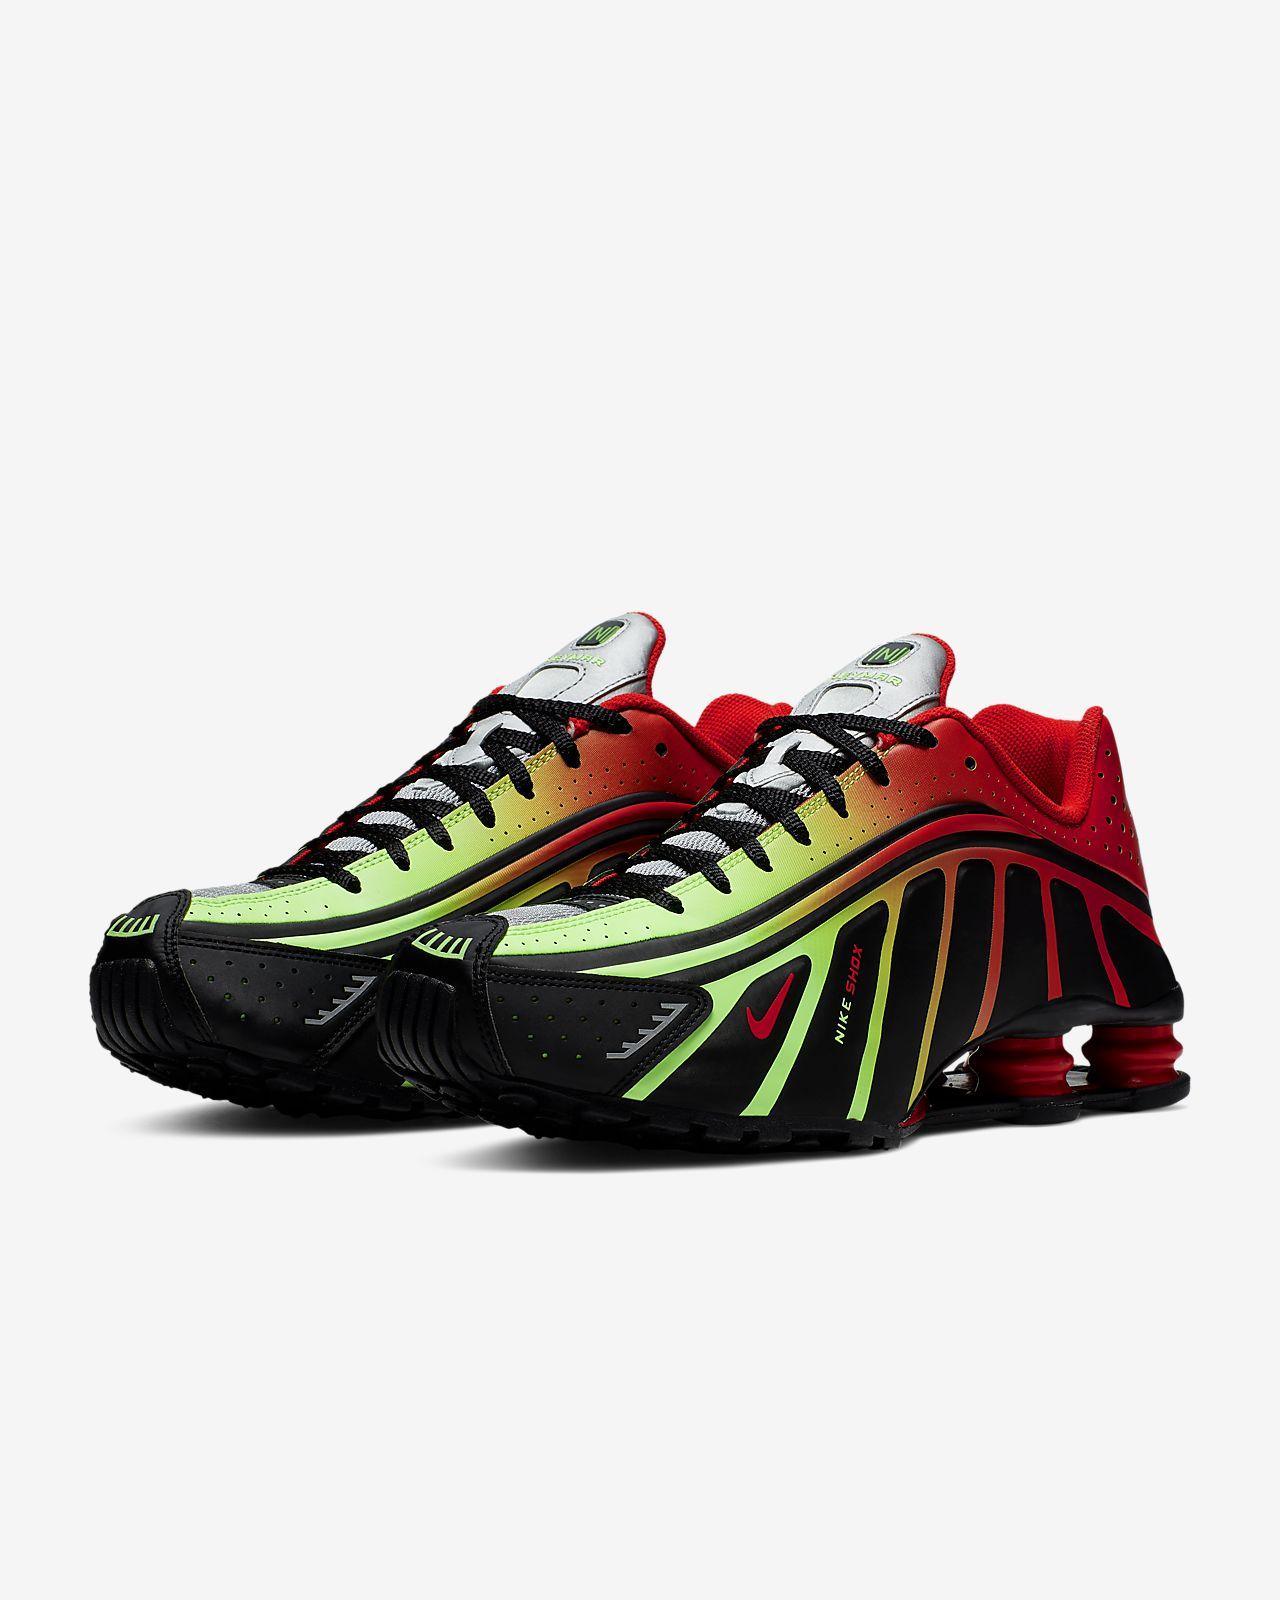 159e9204e Nike Shox R4 Neymar Jr. Shoe. Nike.com